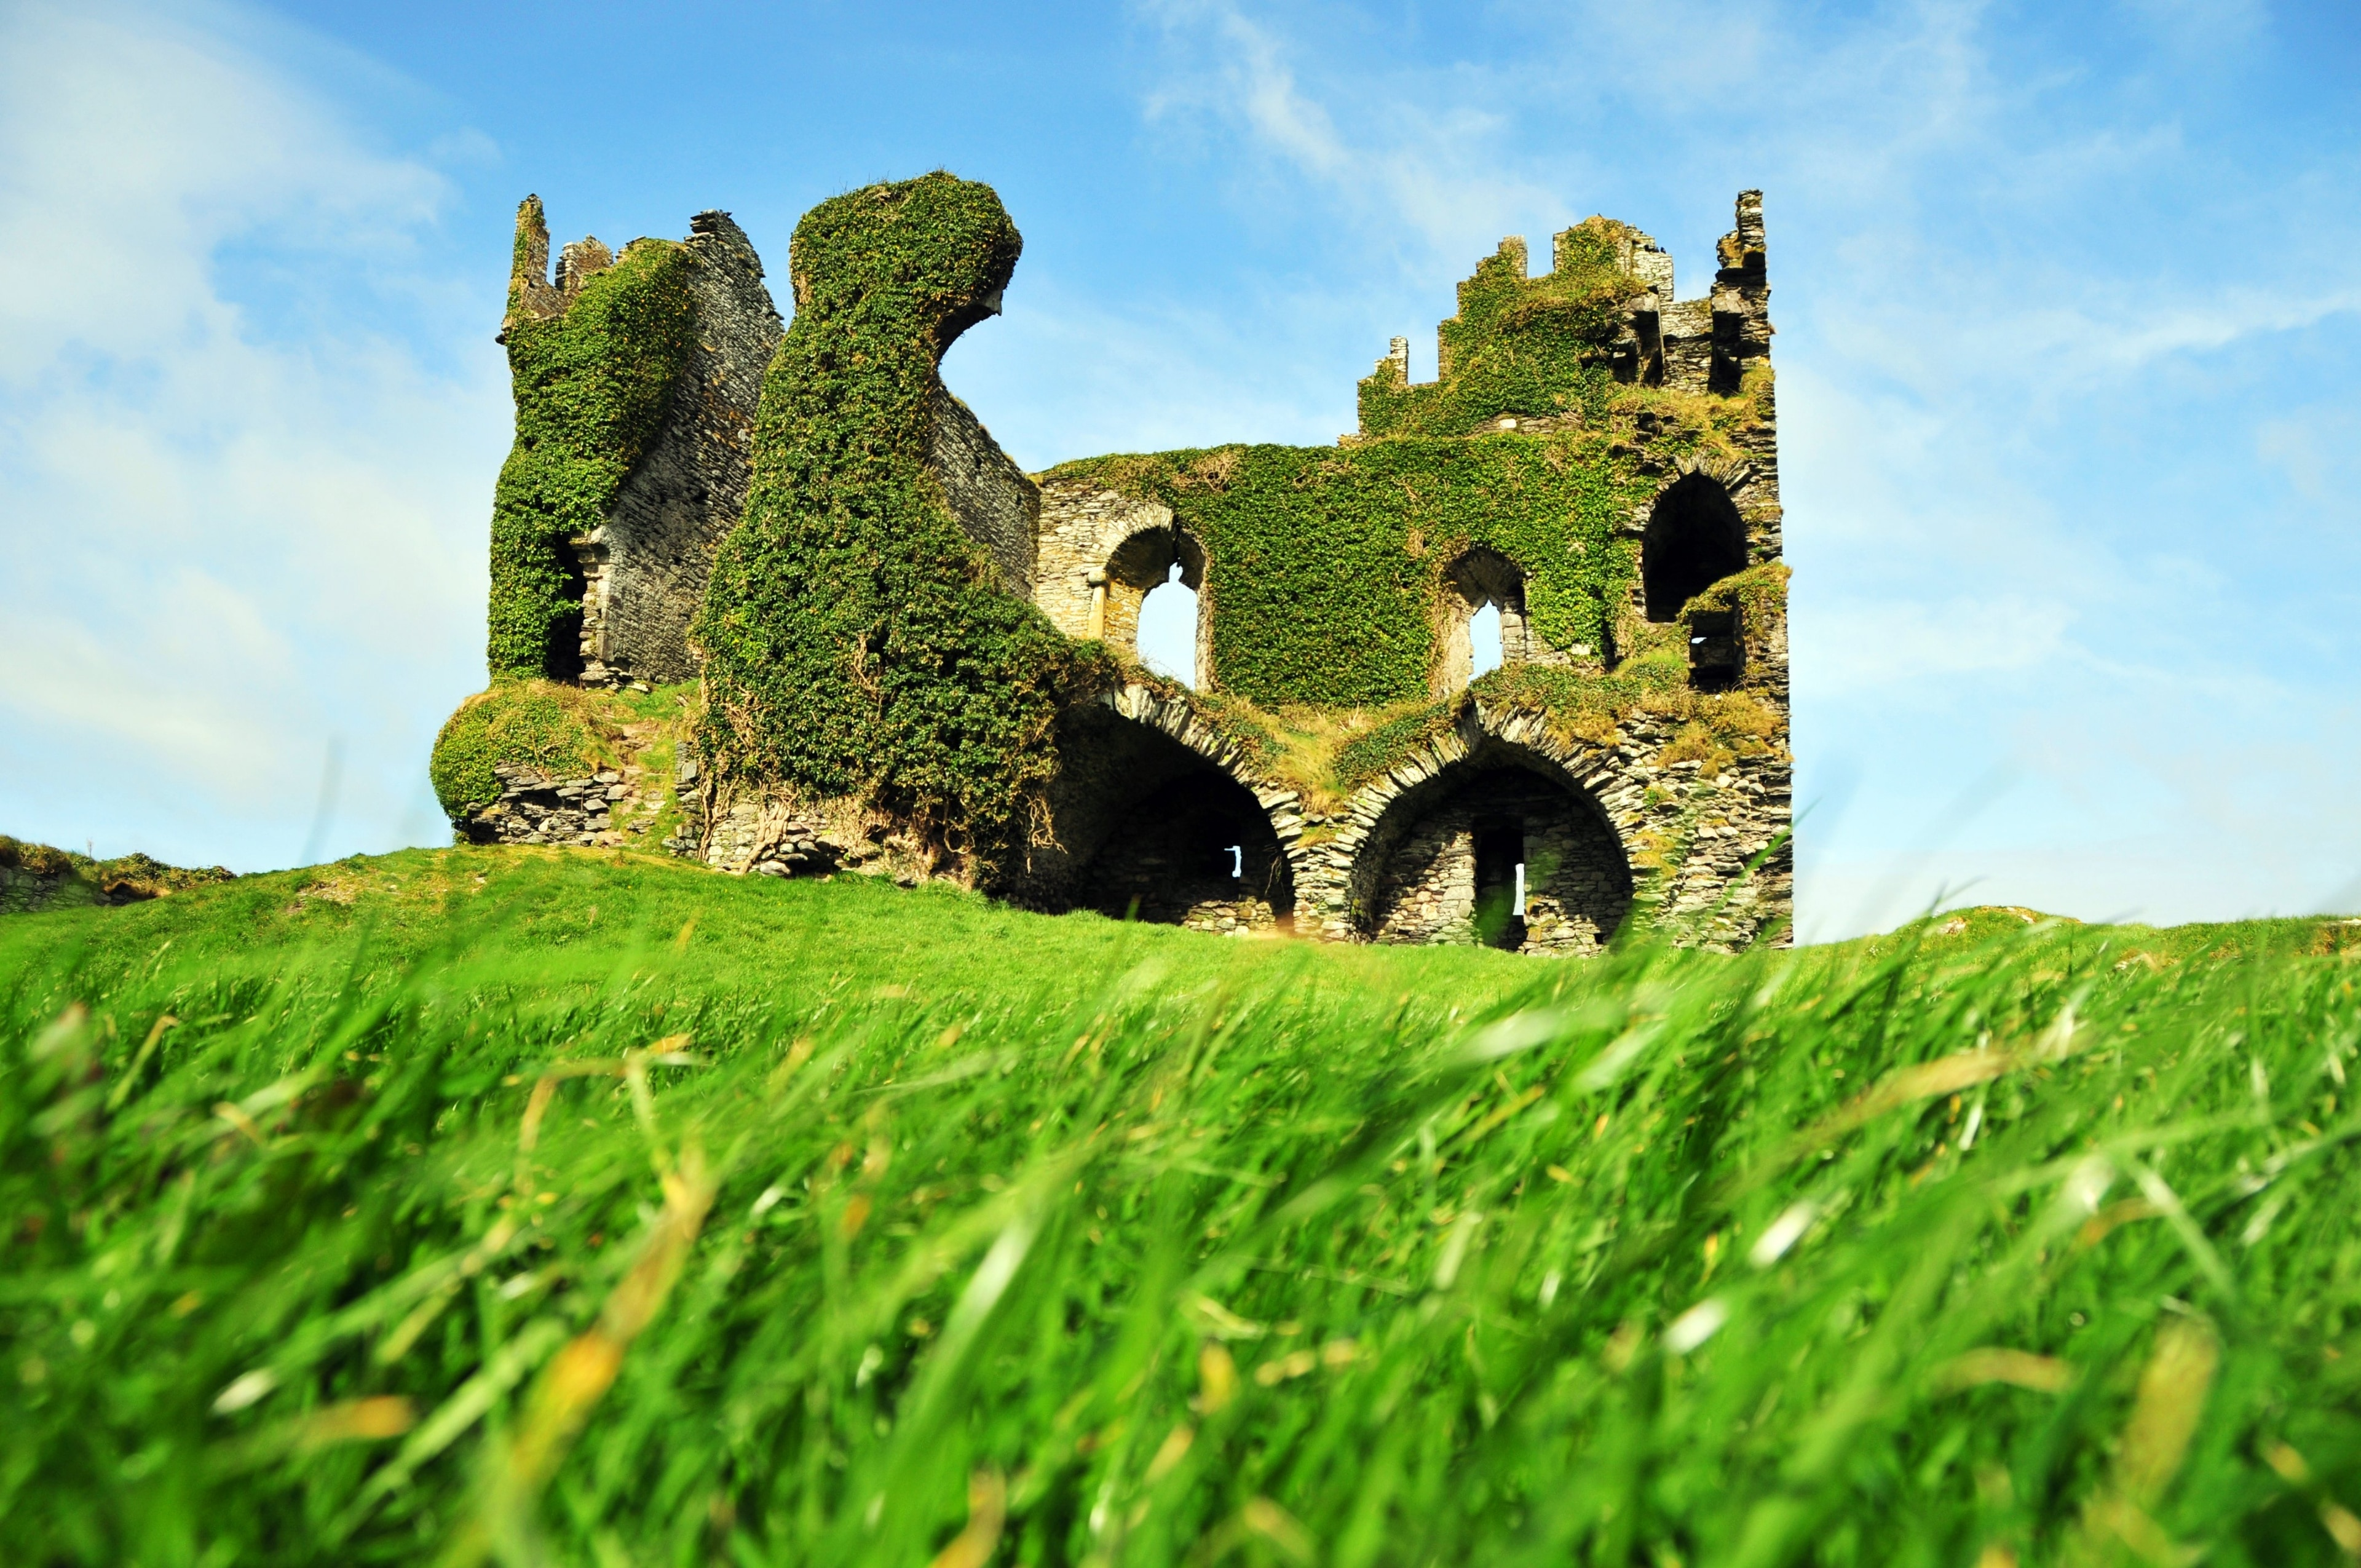 Ballycarbery Castle, Cahirciveen, County Kerry, Ireland